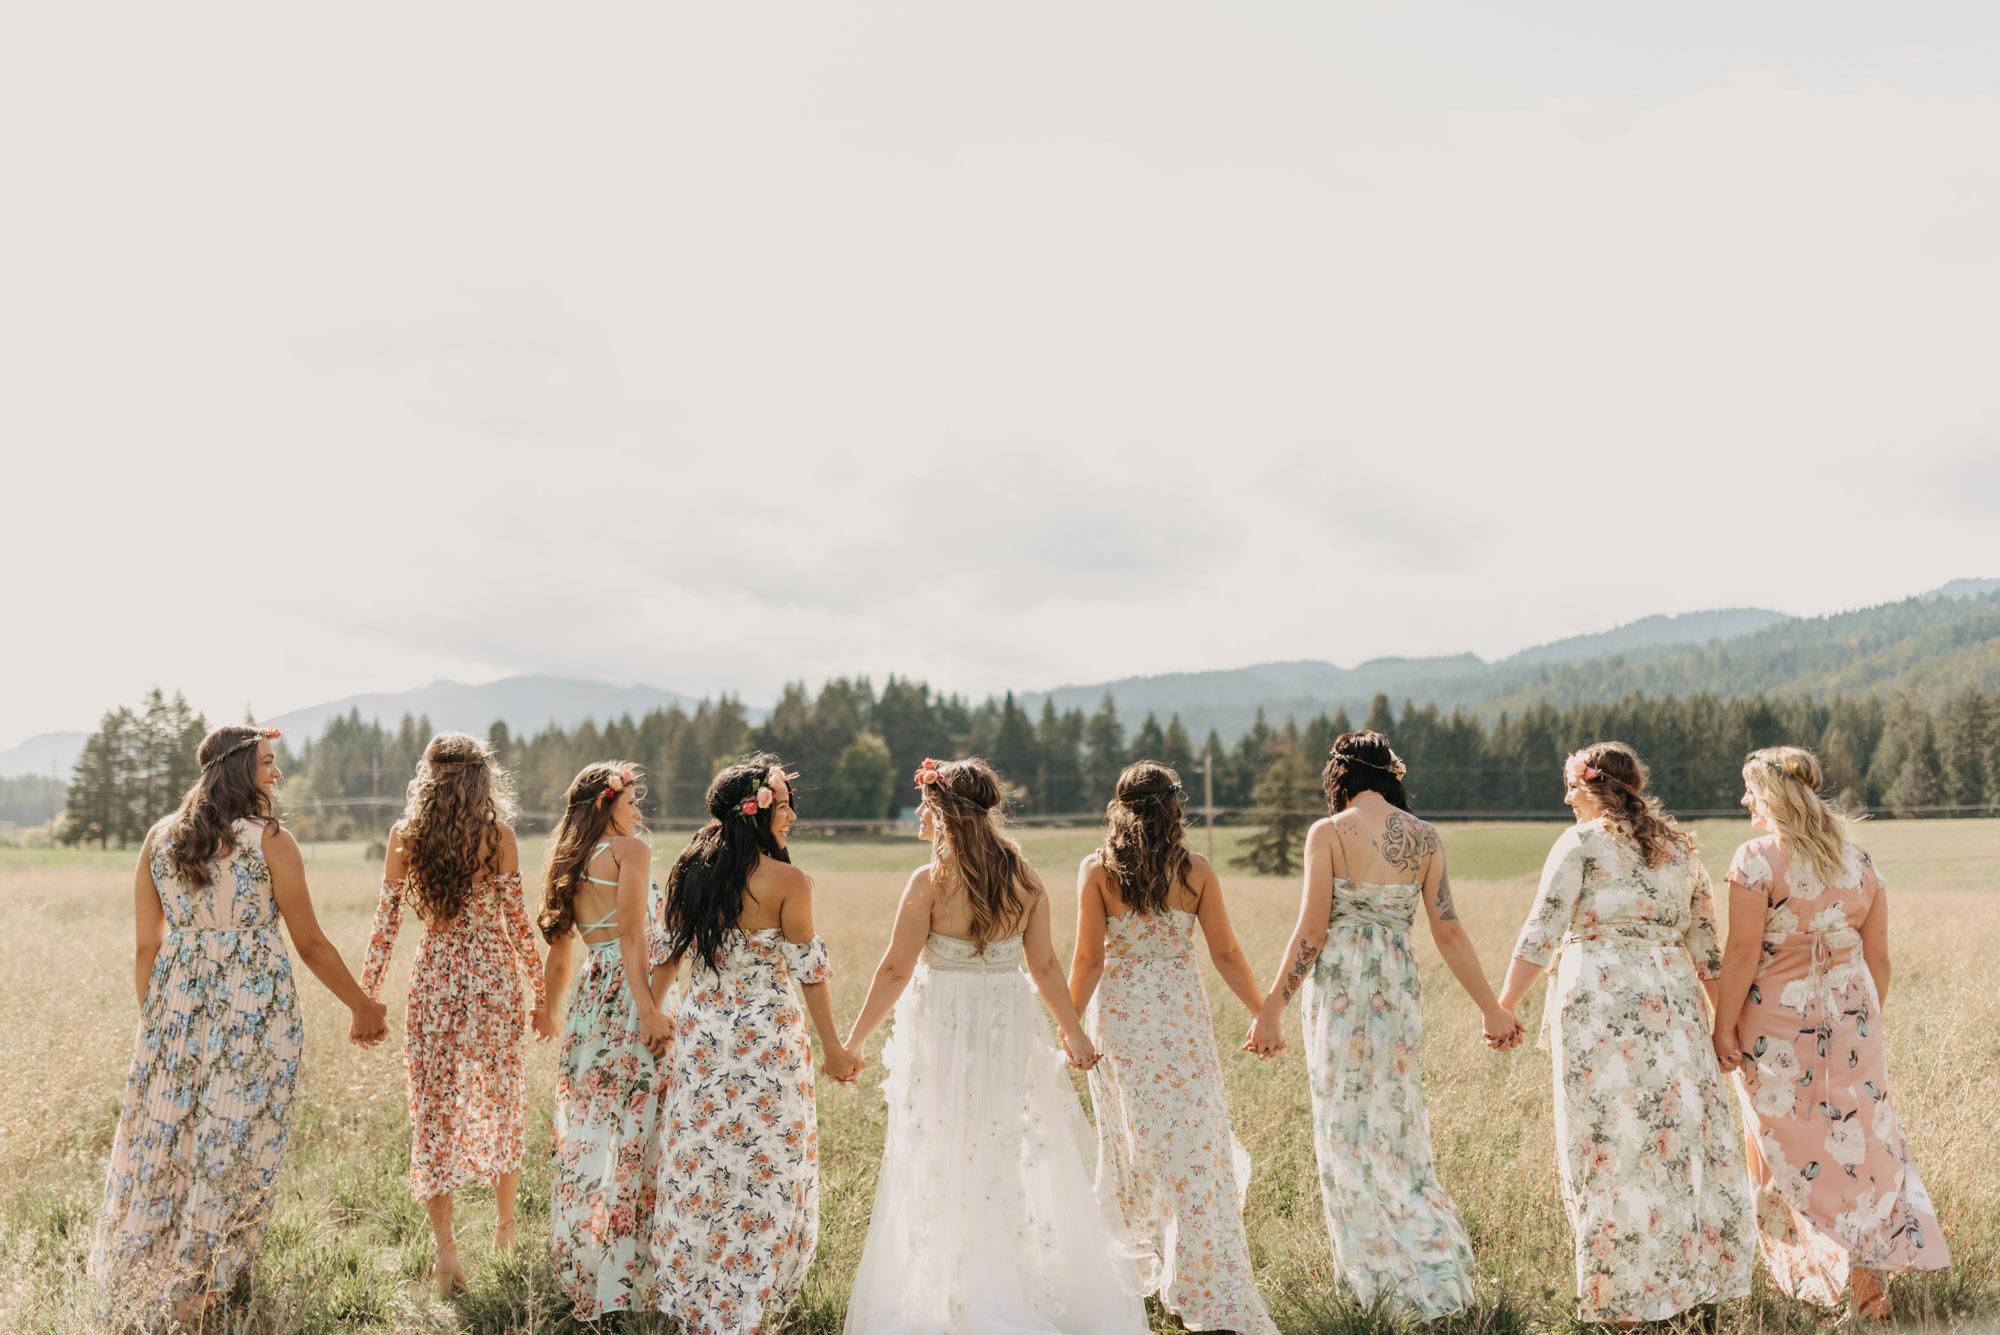 Bridal-Party-Free-People-Flower-Dresses-Washington-Wedding-8547.jpg